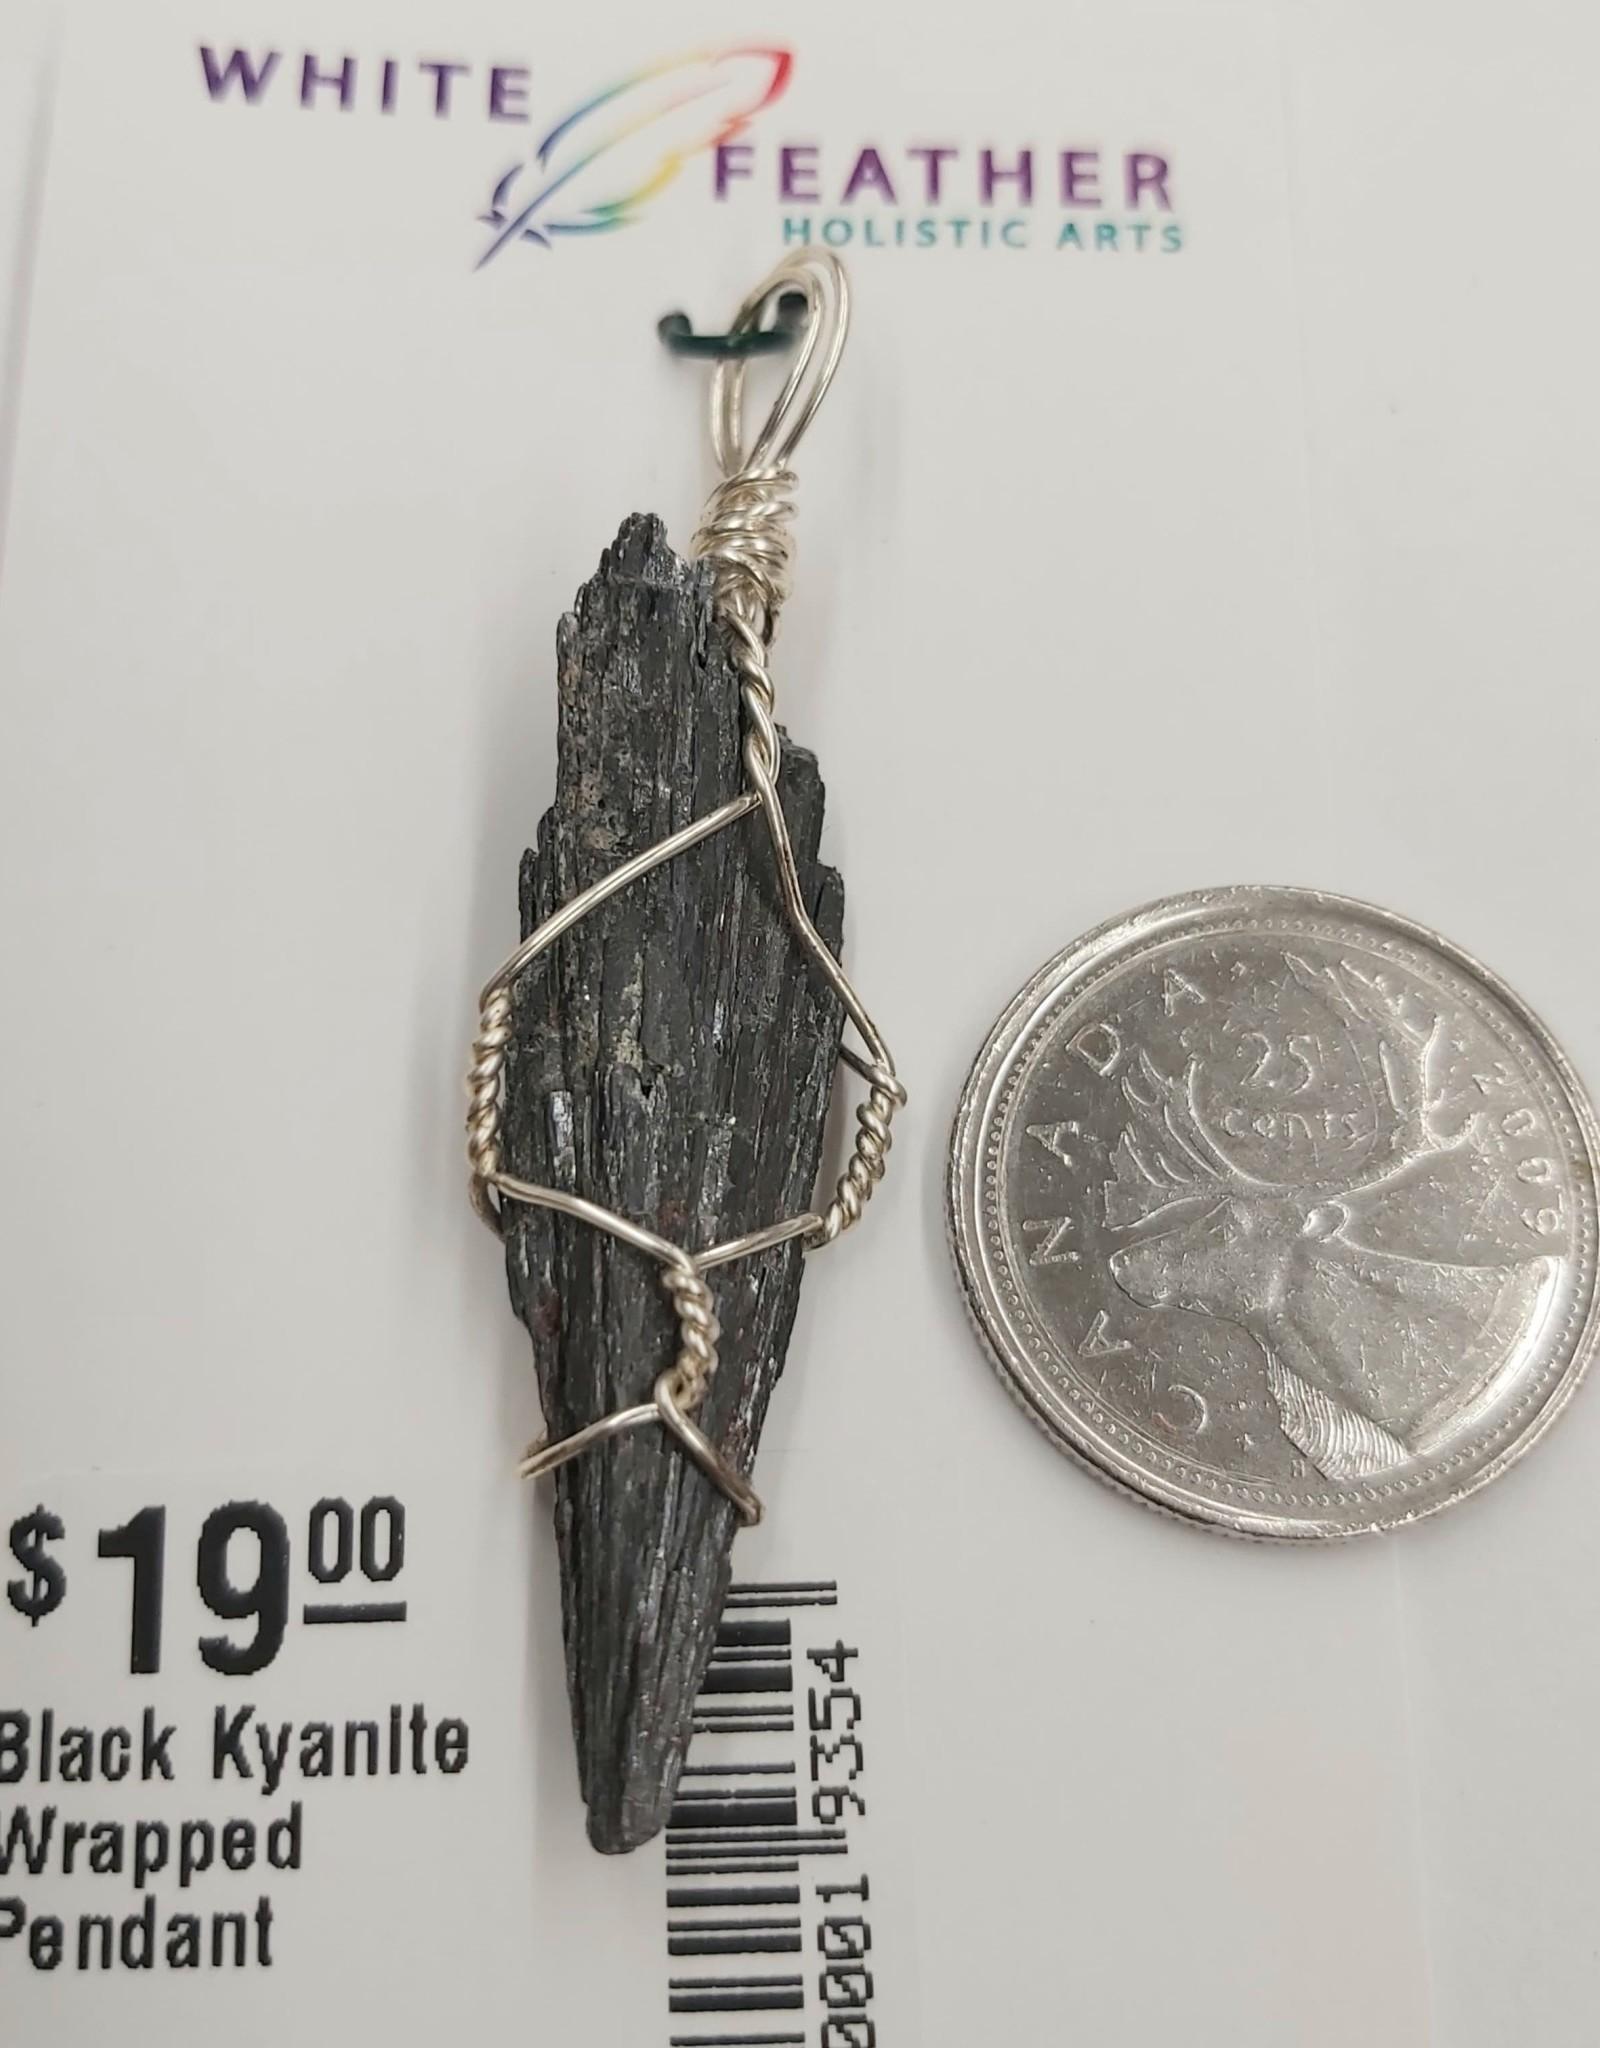 Black Kyanite Wrapped Pendant